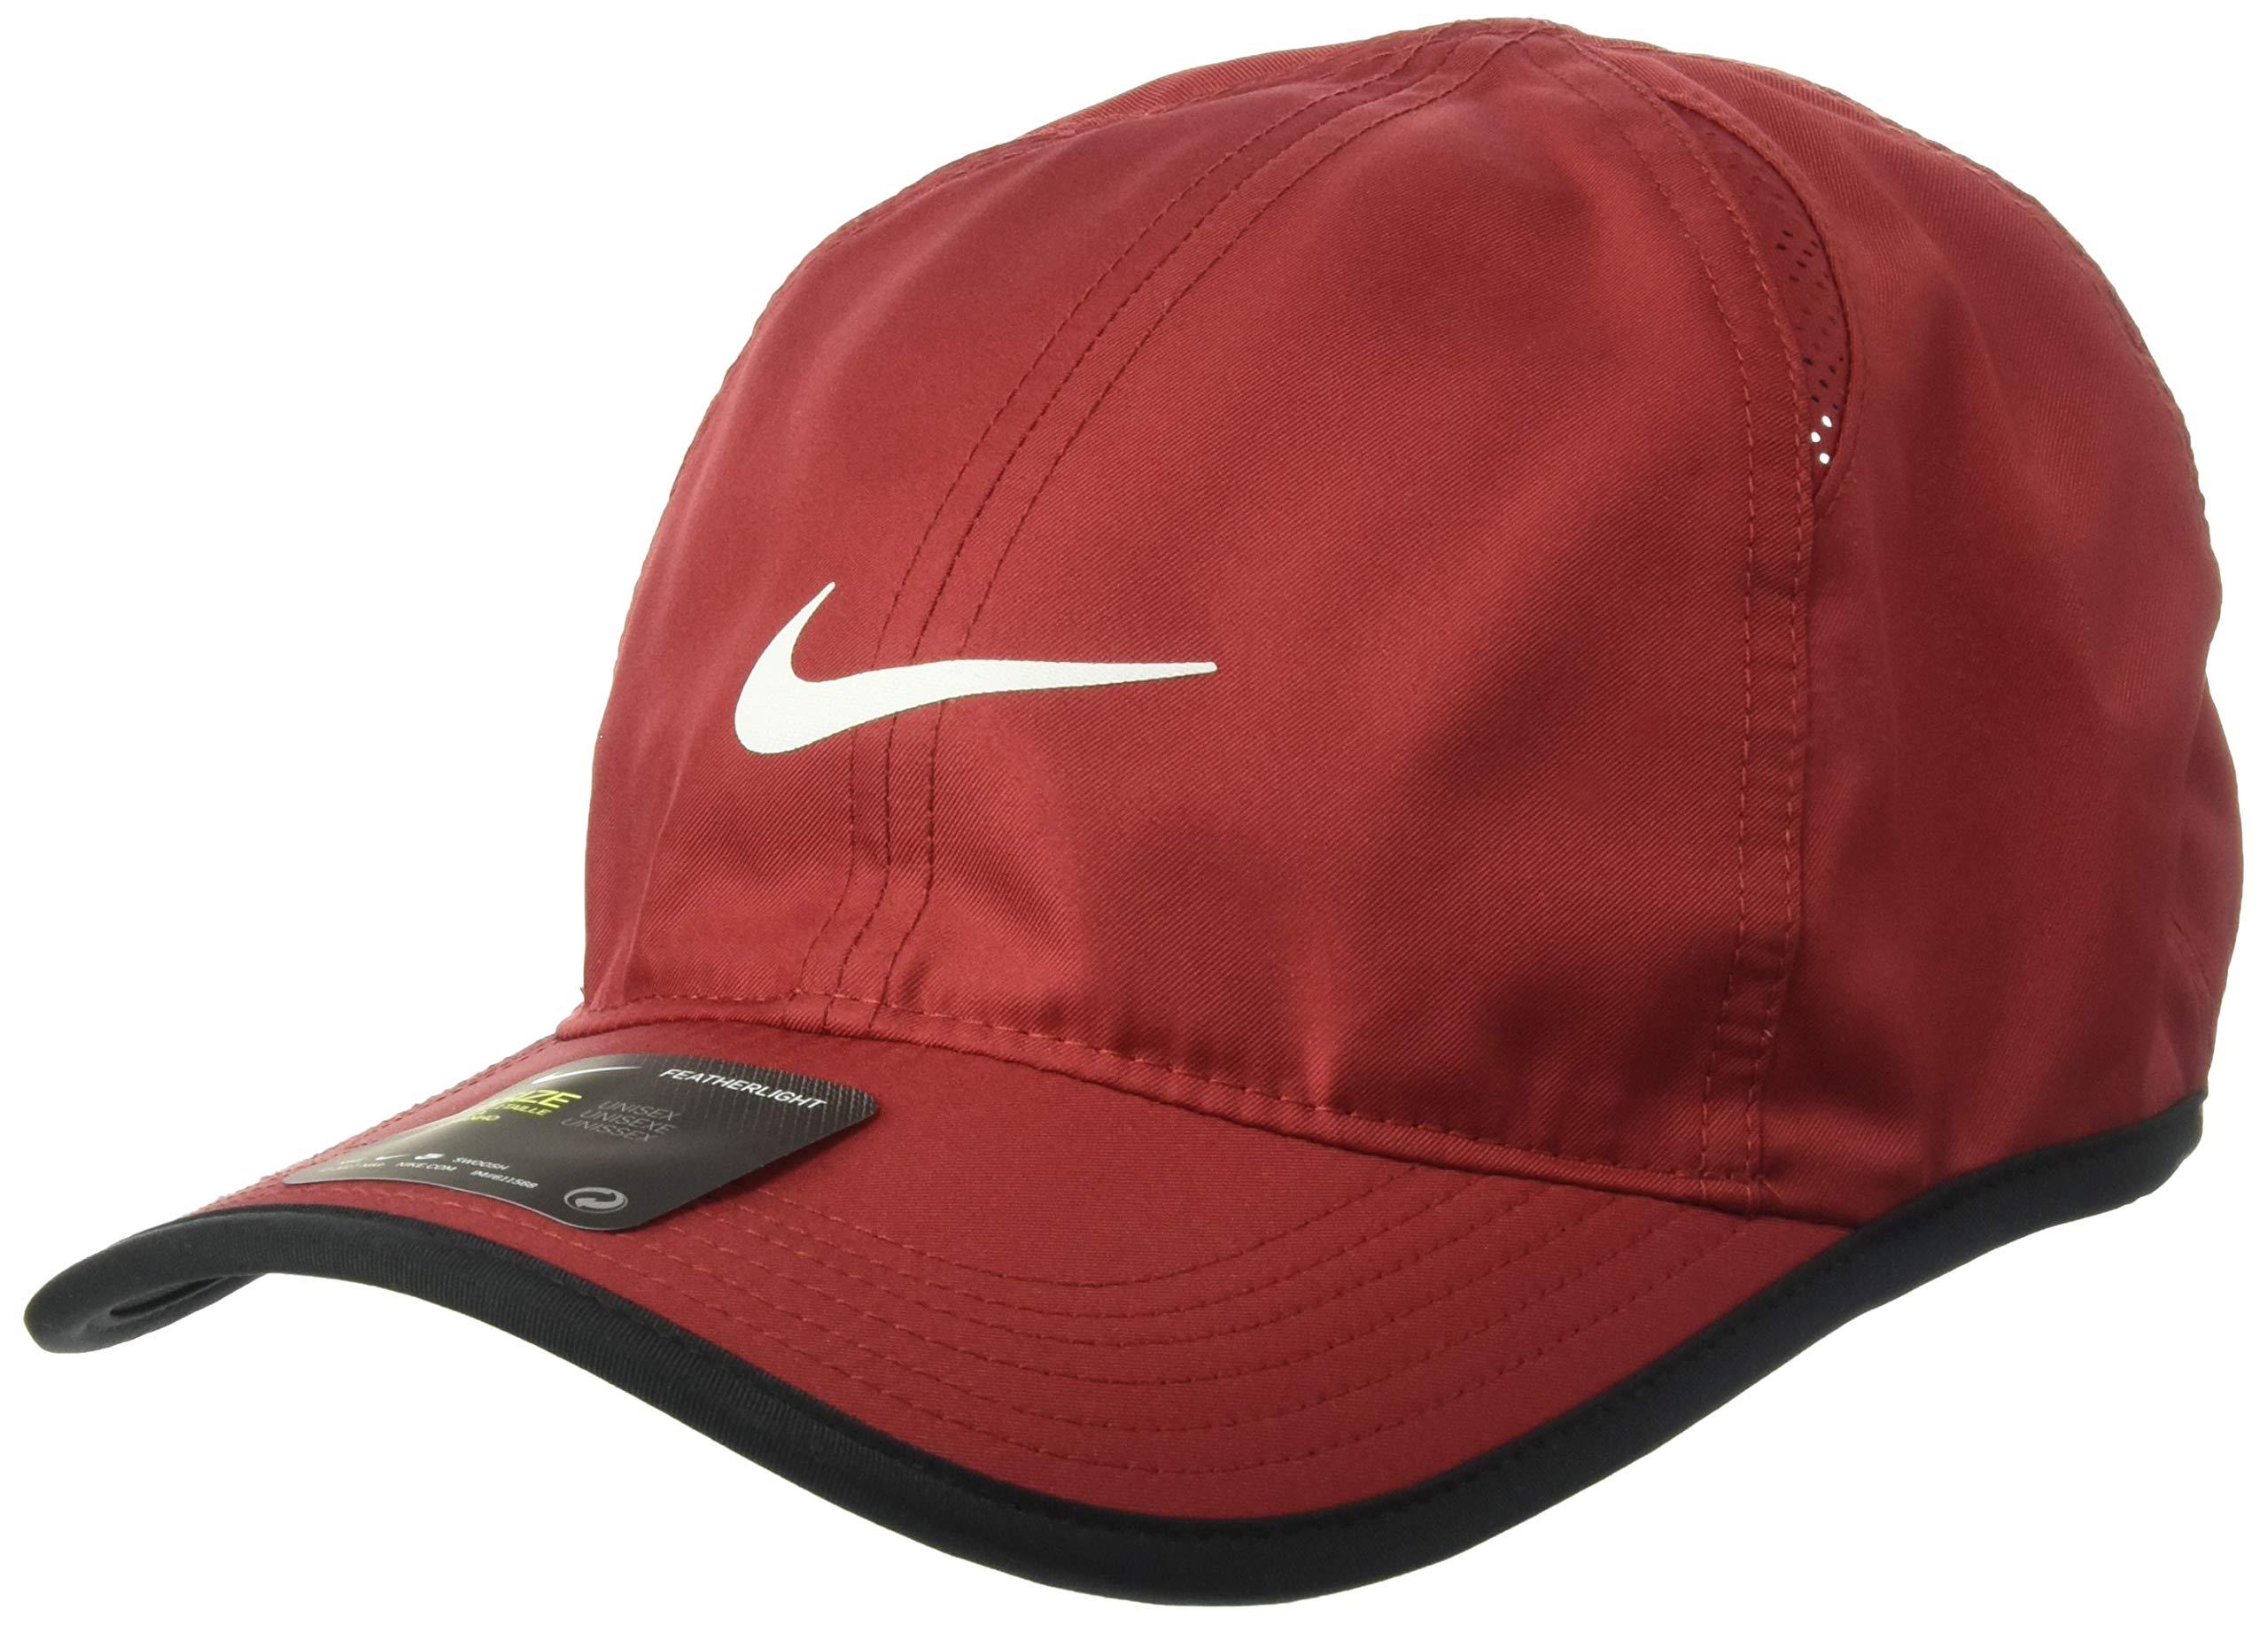 Nike AeroBill Featherlight Cap, Team Crimson/Black/White, Misc by Nike